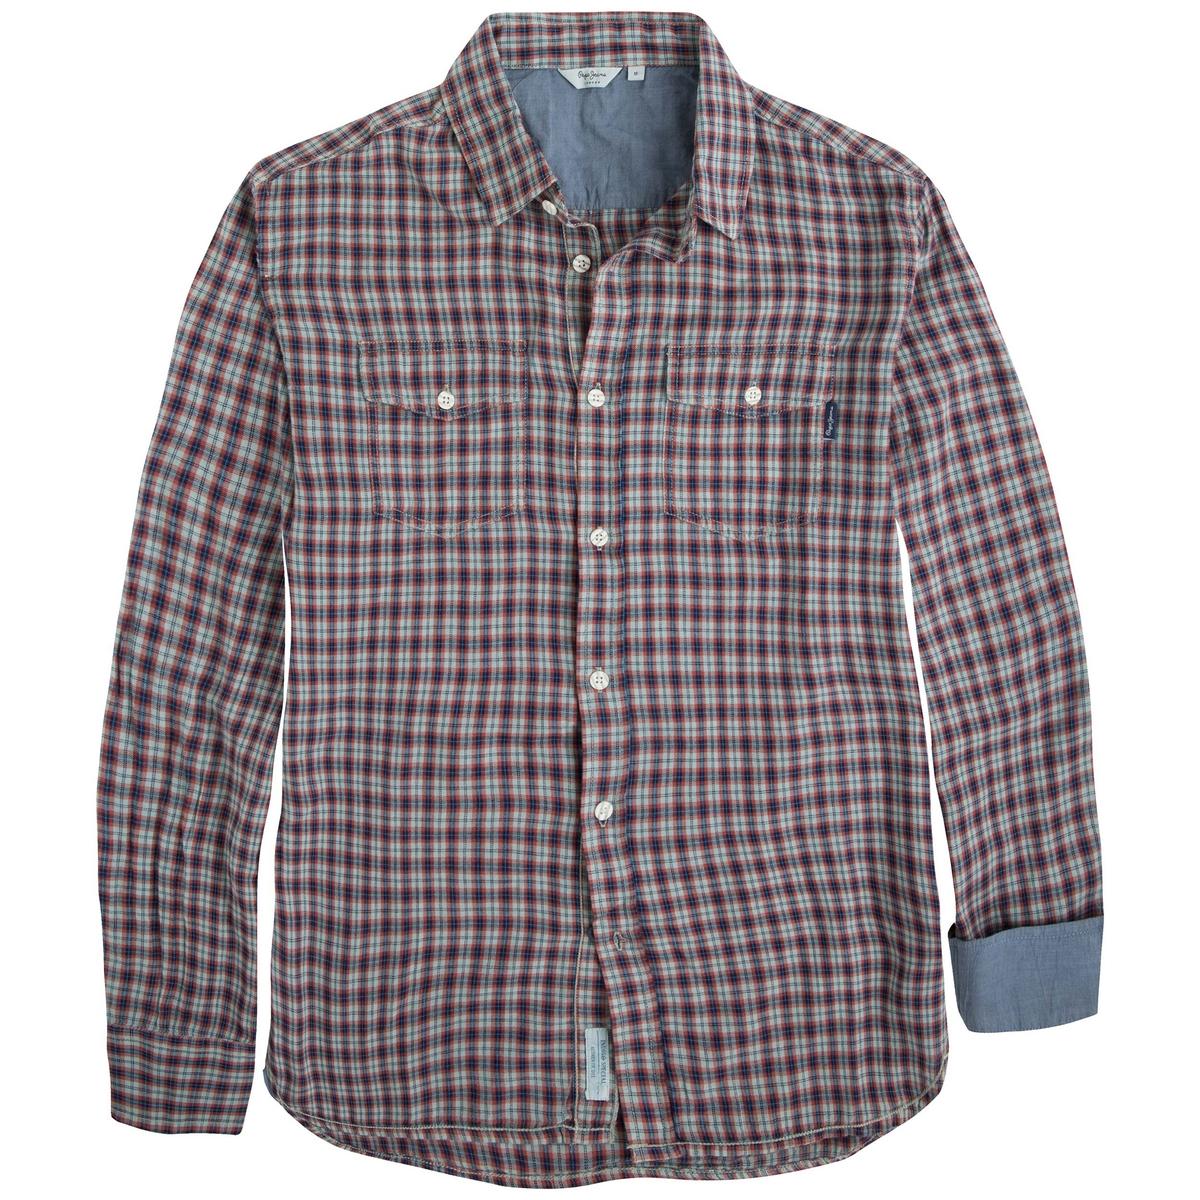 Рубашка PEPE JEANS IRONSHELLСостав и описание :Материал : 97% хлопка, 3% льна Марка : PEPE JEANS<br><br>Цвет: в клетку